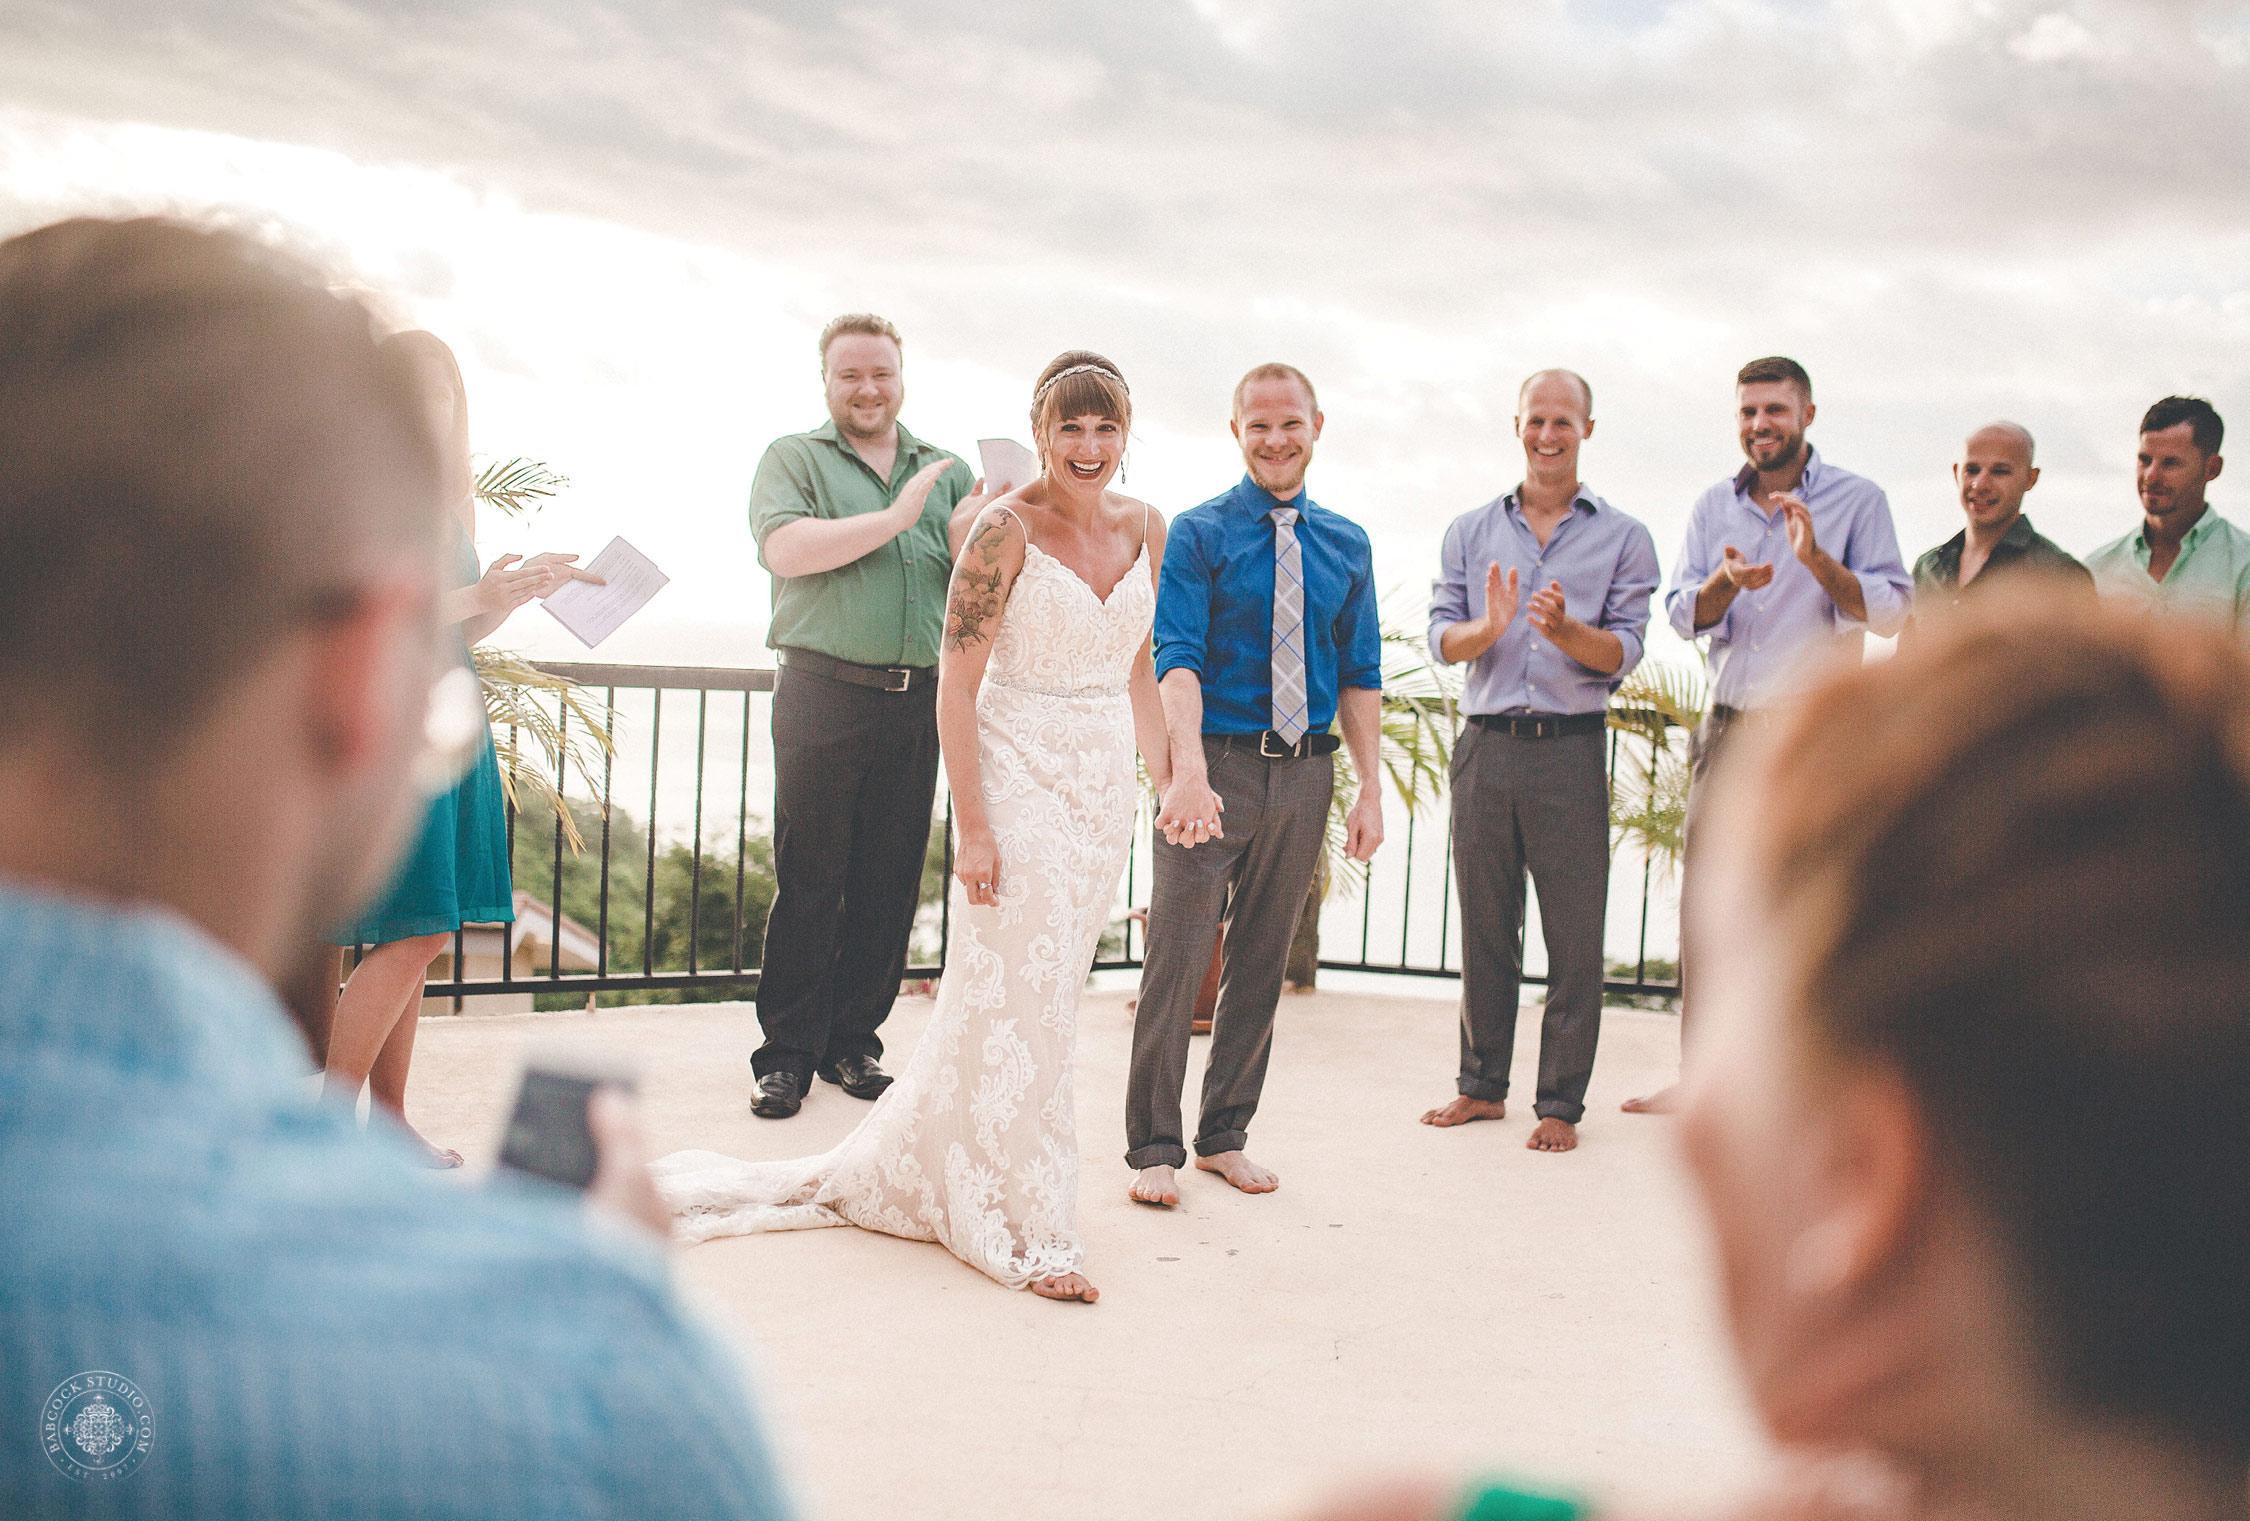 2cat-brandon-costa-rica-destination-wedding-photographer-dayton-ohio-23.jpg